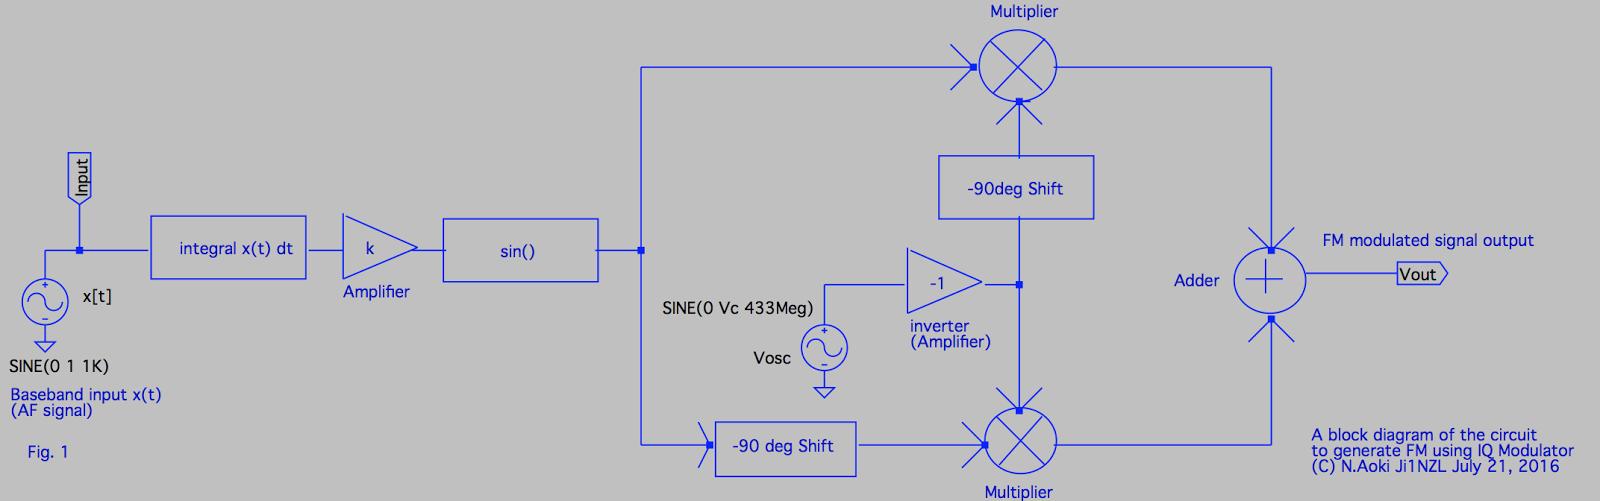 small resolution of fm modulator used an iq modulator